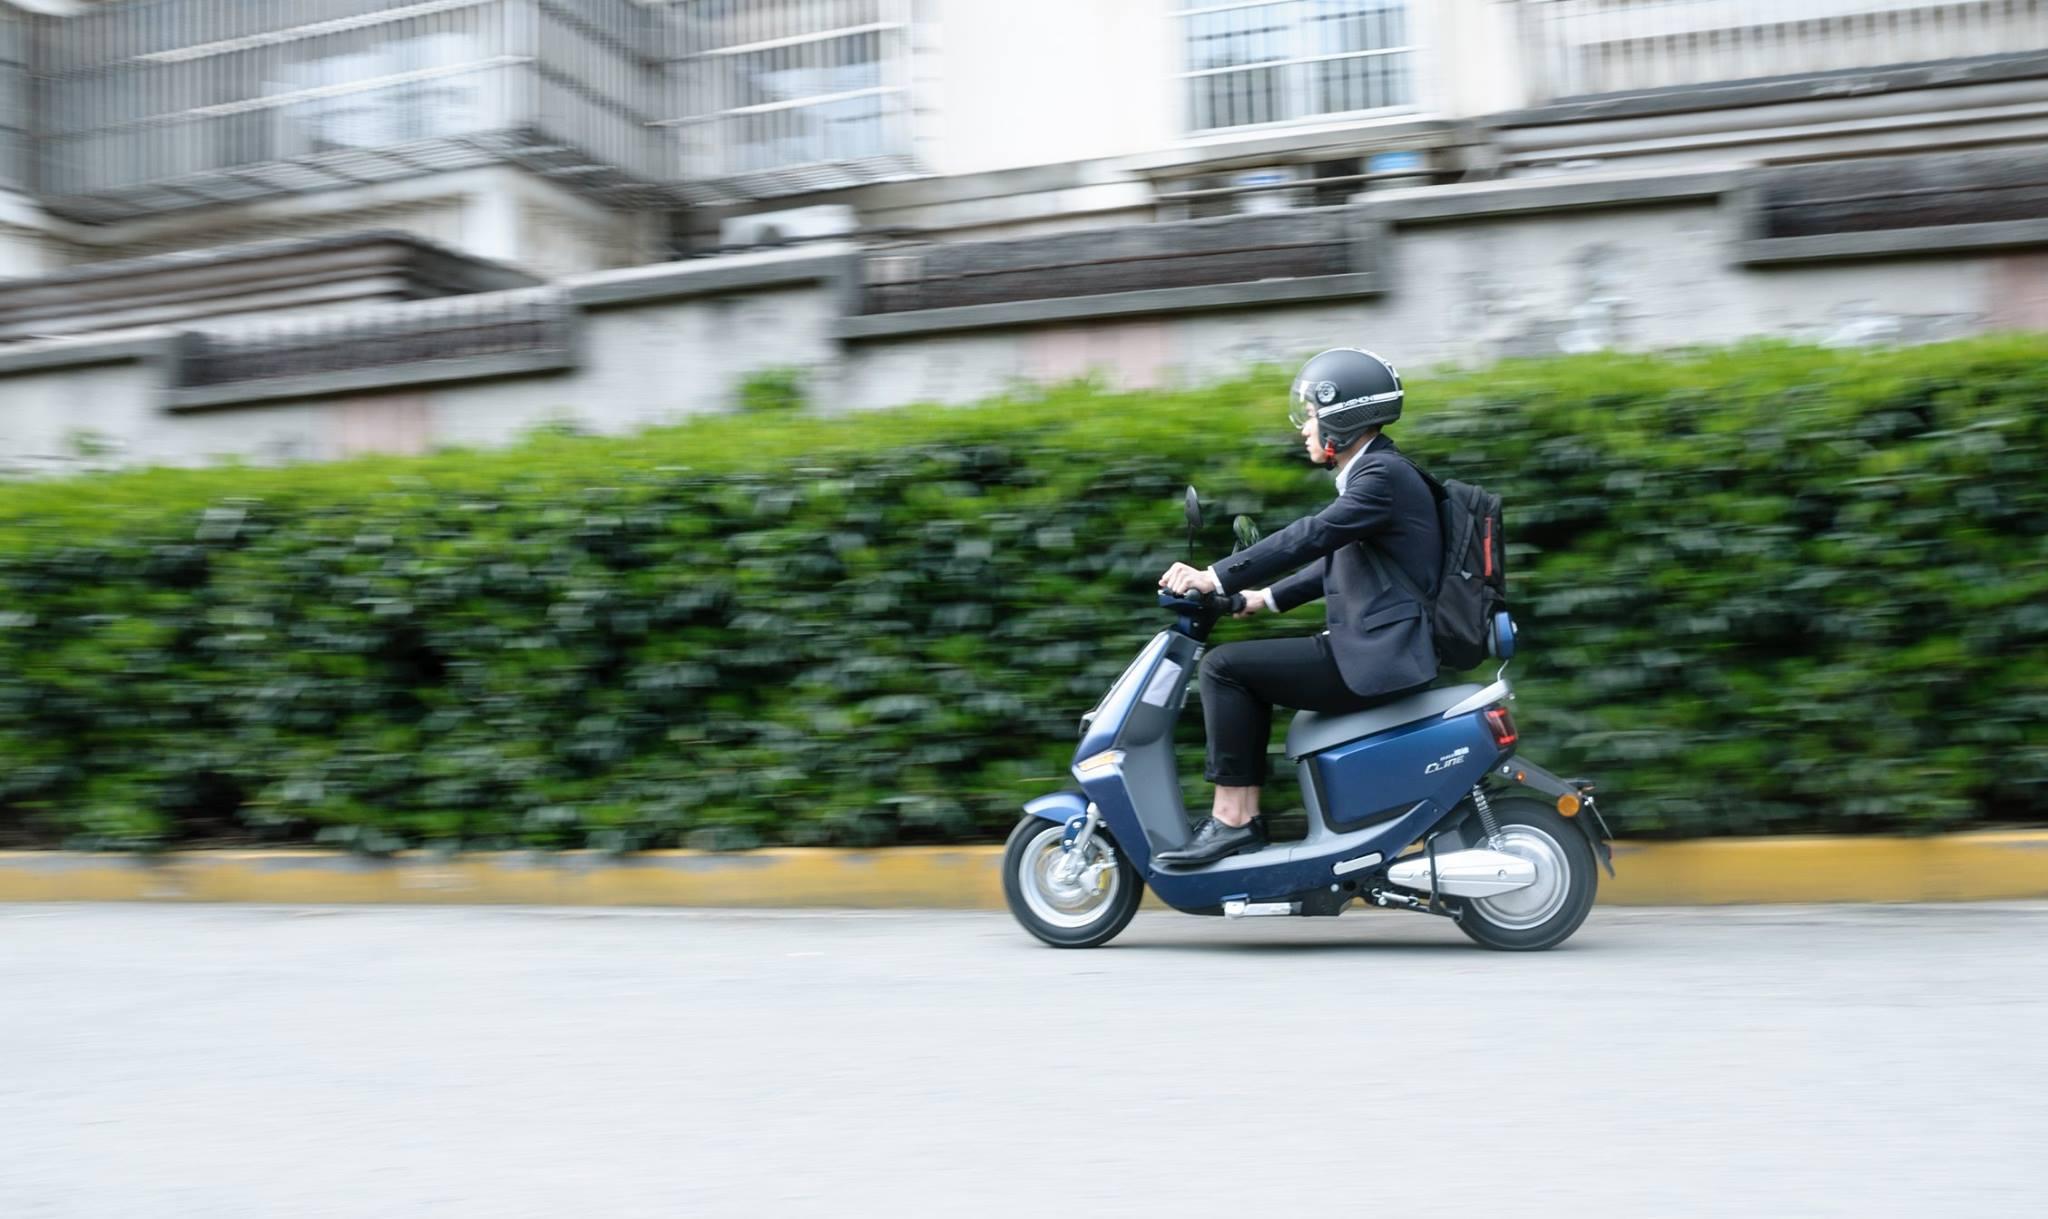 ЭЛЕКТРОСКУТЕР YADEA C-LINE ( AGM )  Артмото - купить квадроцикл в украине и харькове, мотоцикл, снегоход, скутер, мопед, электромобиль